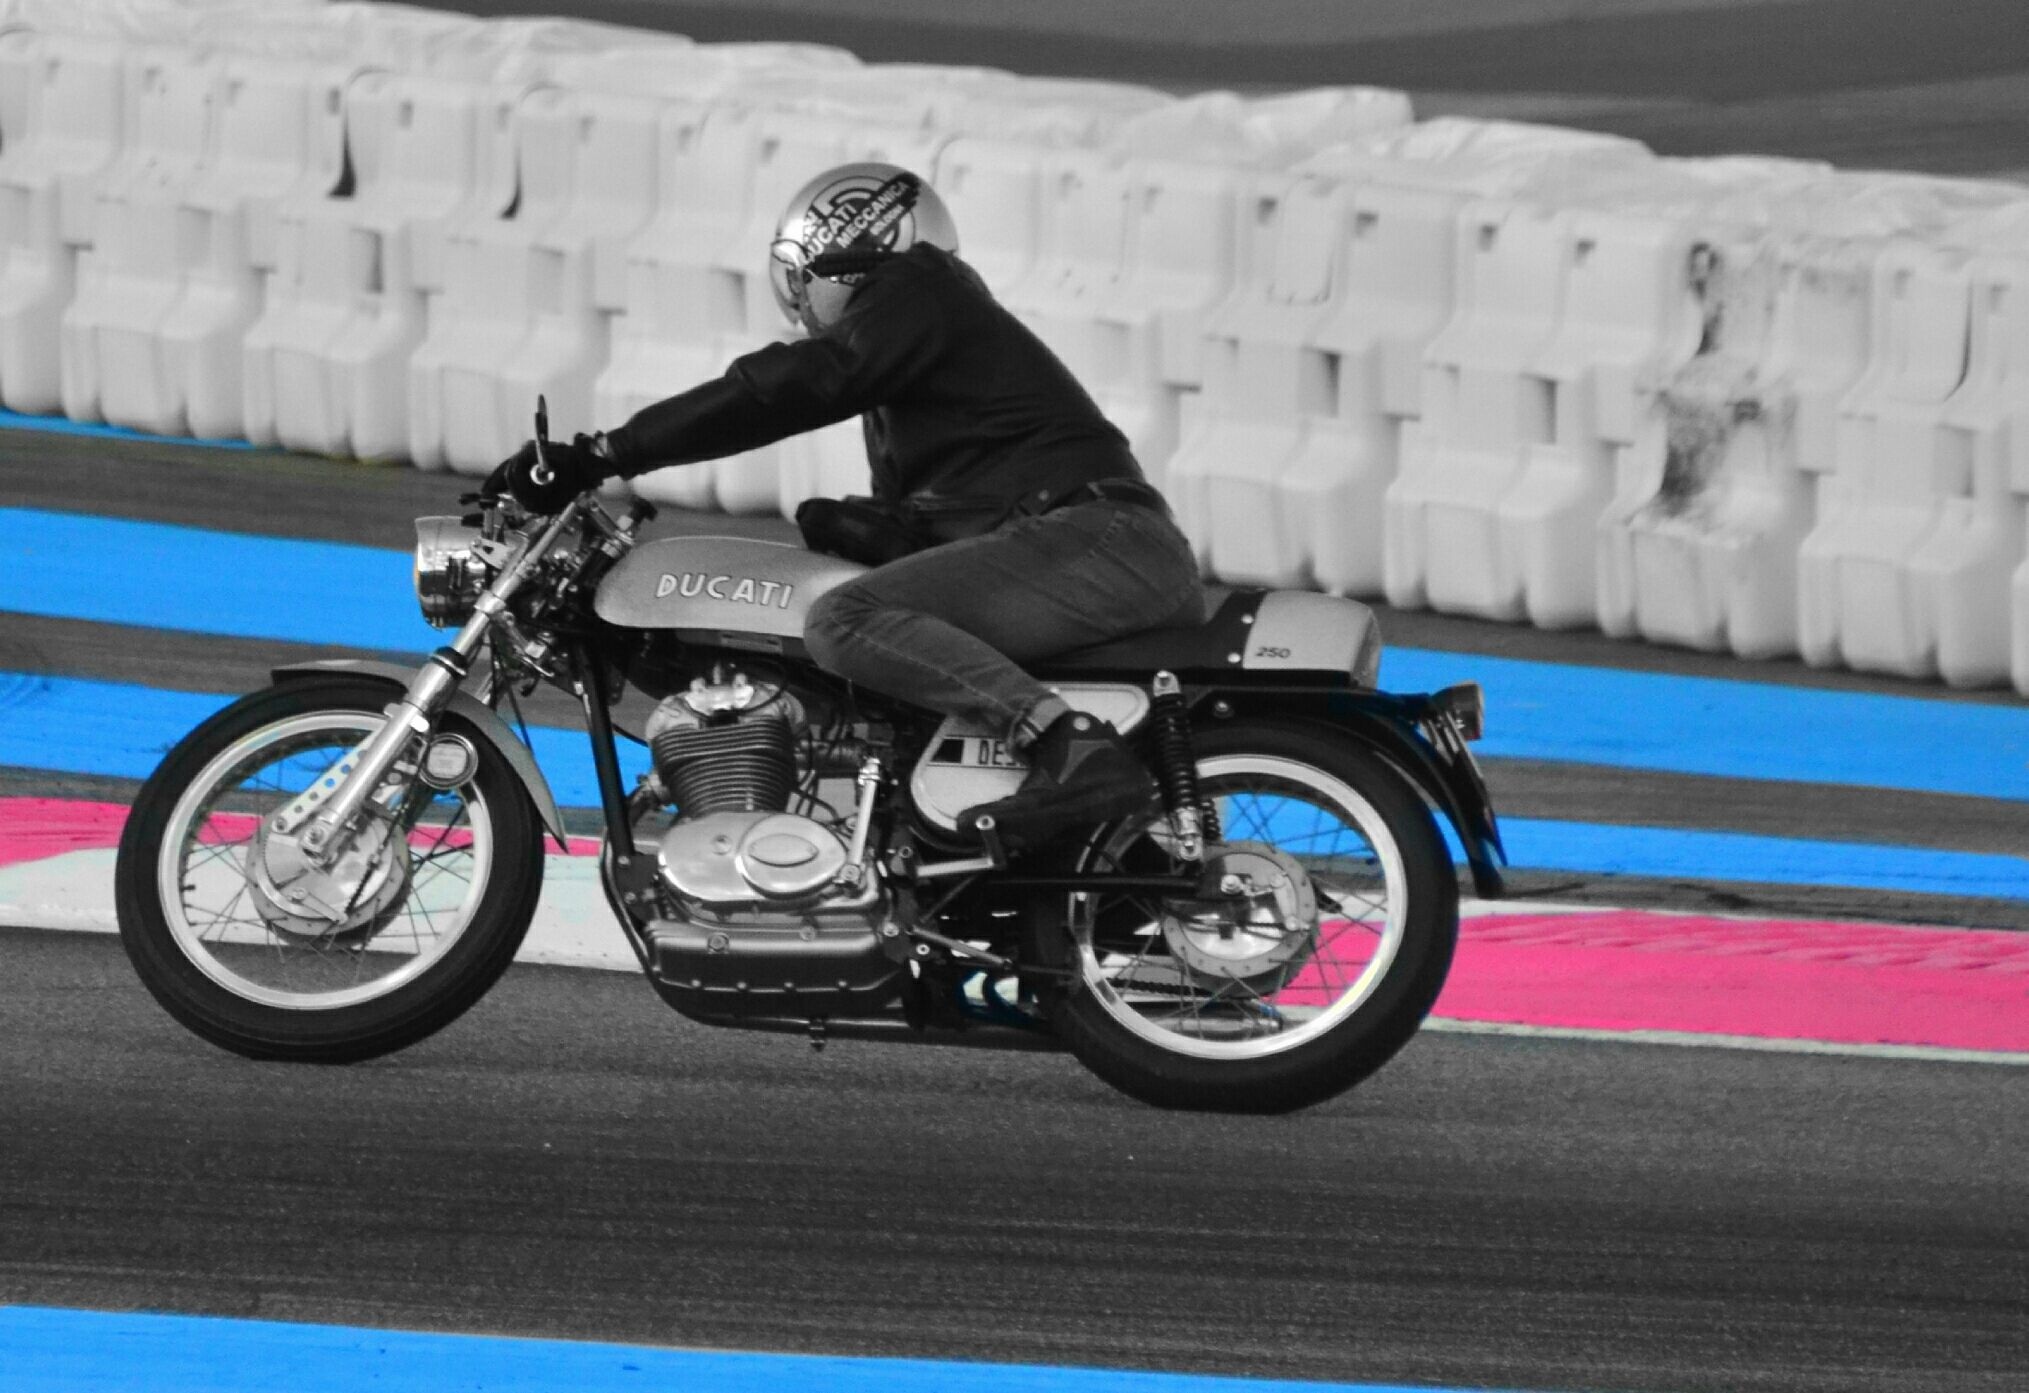 Circuit Castellet 2016 Moto ducati, Motorcycle, Ducati